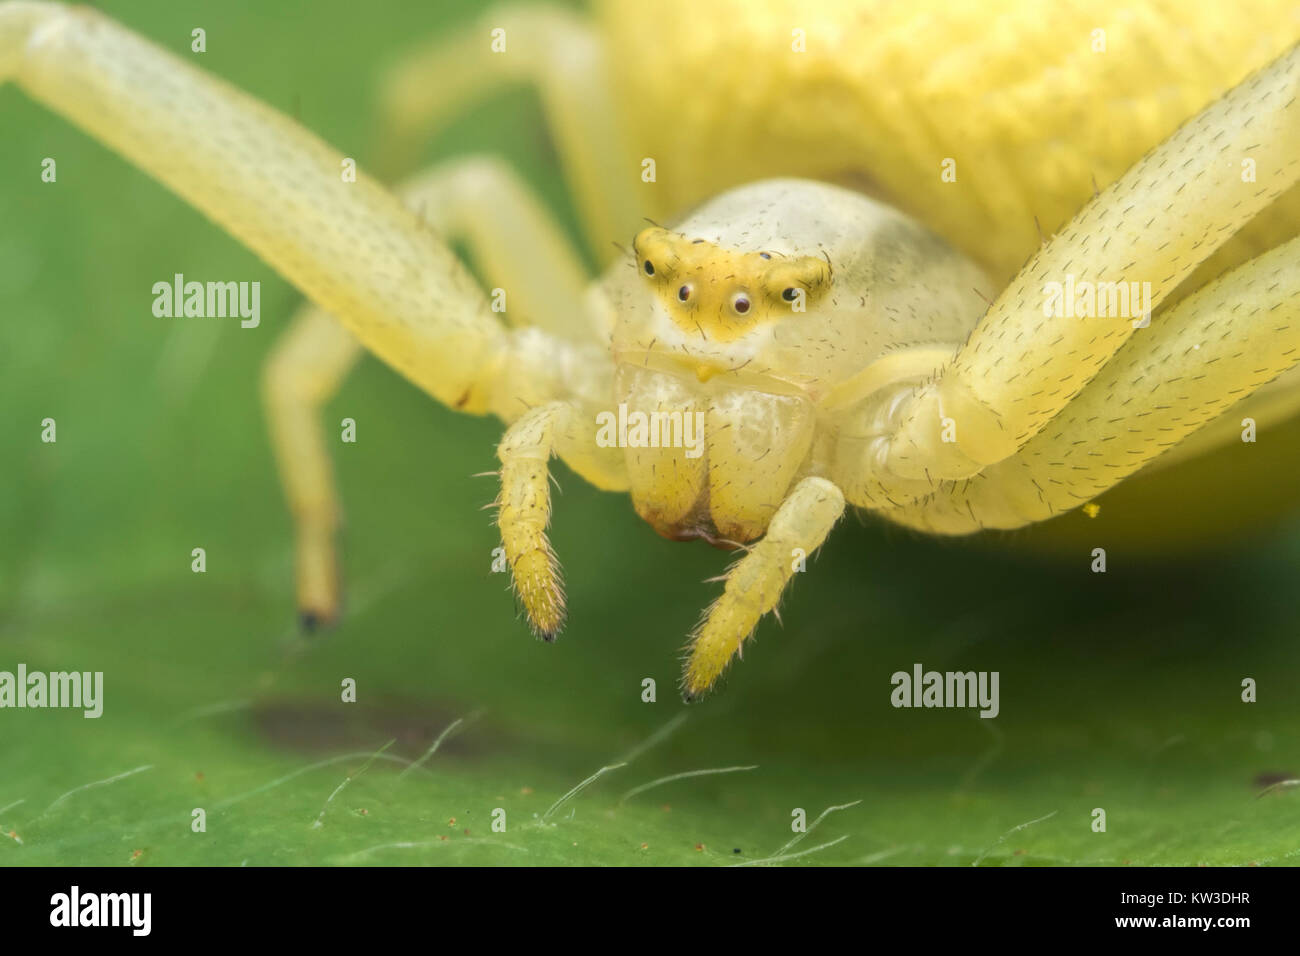 Crab Spider (Misumena vatia) Nahaufnahme Makro Foto von den Kopf. Thurles, Tipperary, Irland. Stockfoto